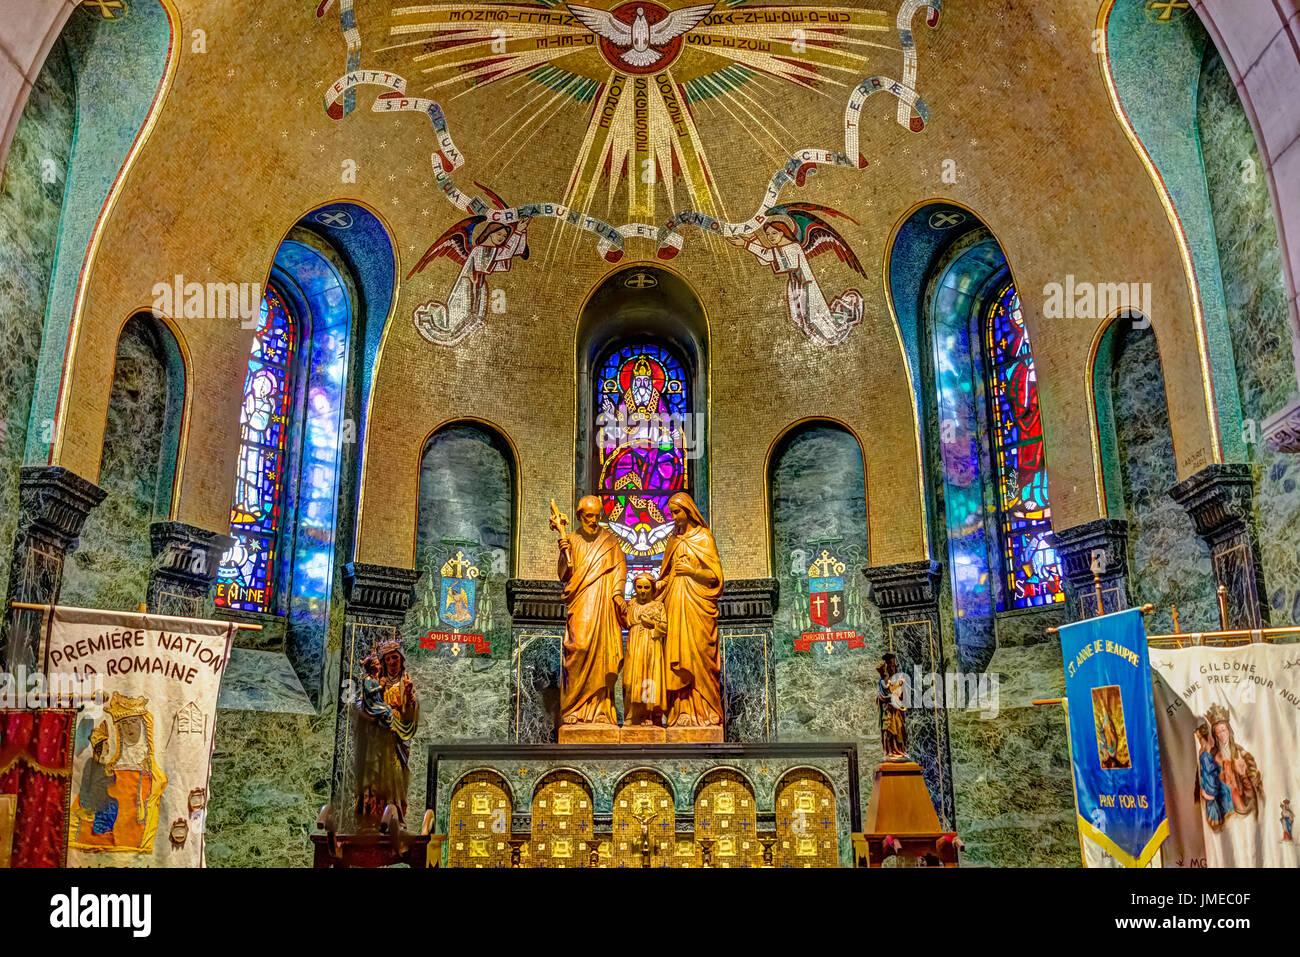 Sainte-Anne-de-Beaupre, Canada - June 2, 2017: Inside Basilica of Sainte Anne de Beaupre with statues and signs Stock Photo